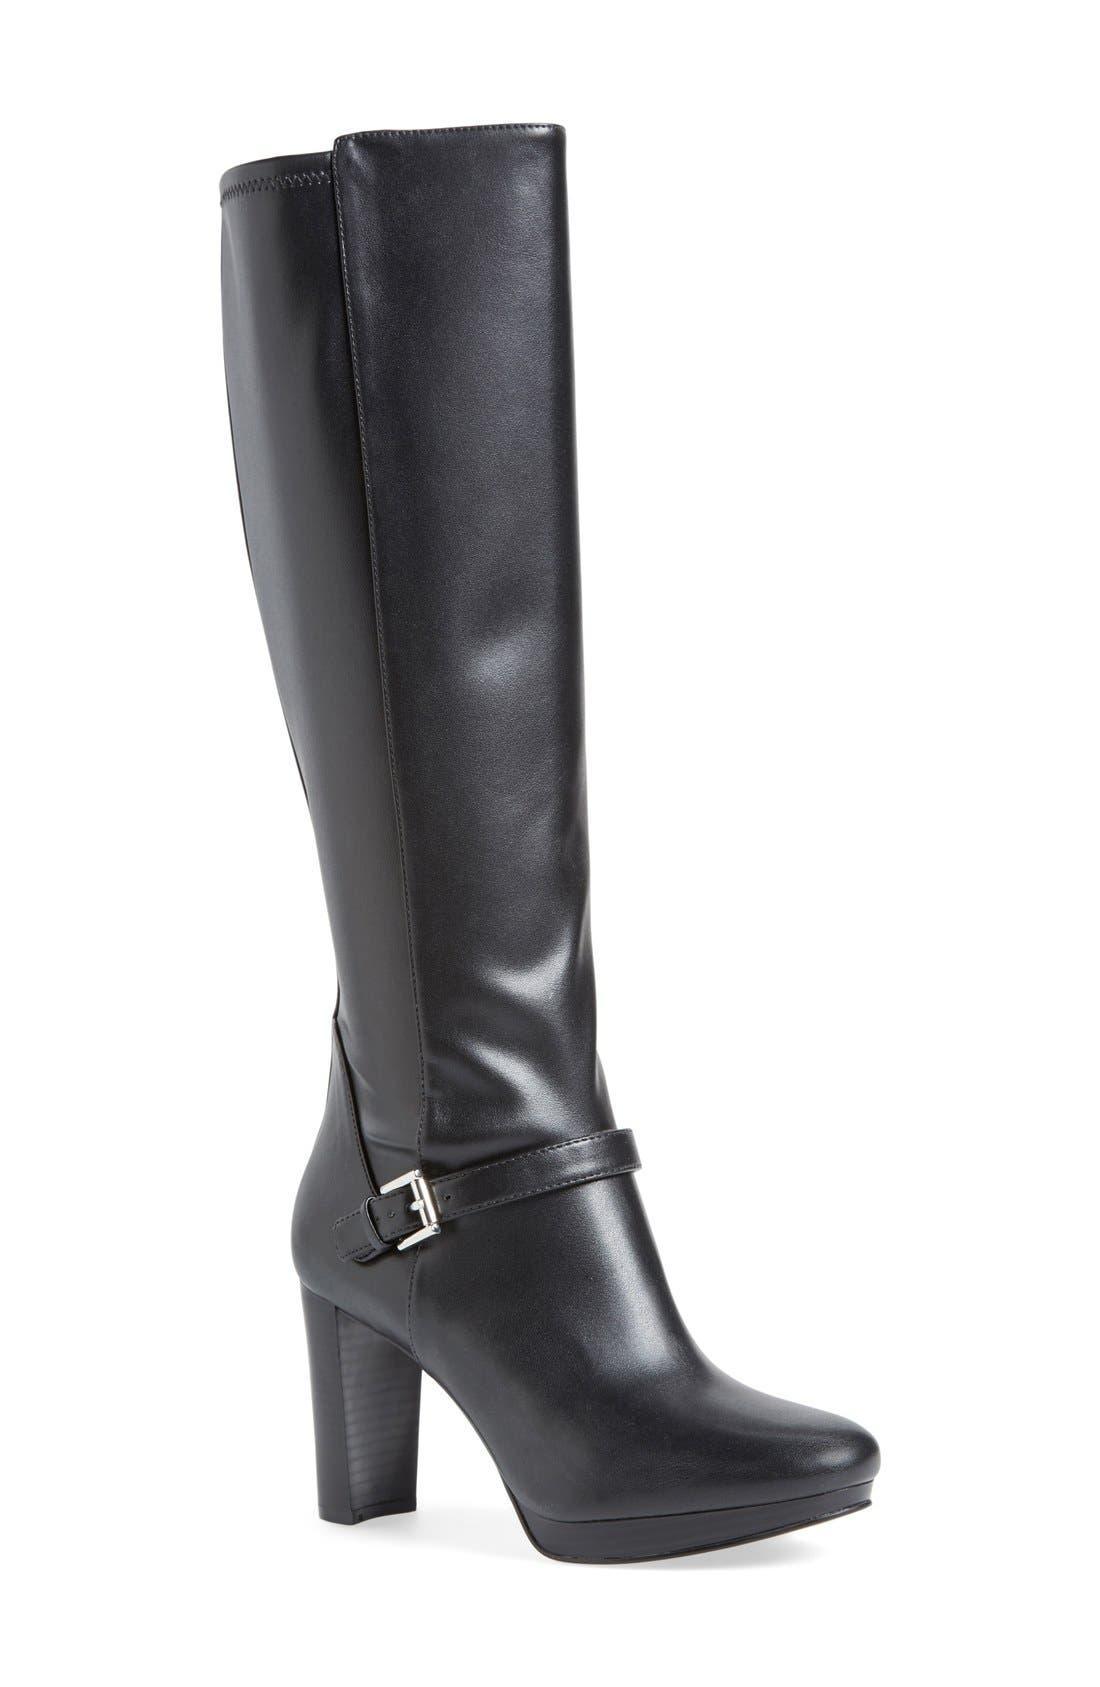 Main Image - Nine West 'Kacie' Tall Boot (Women)